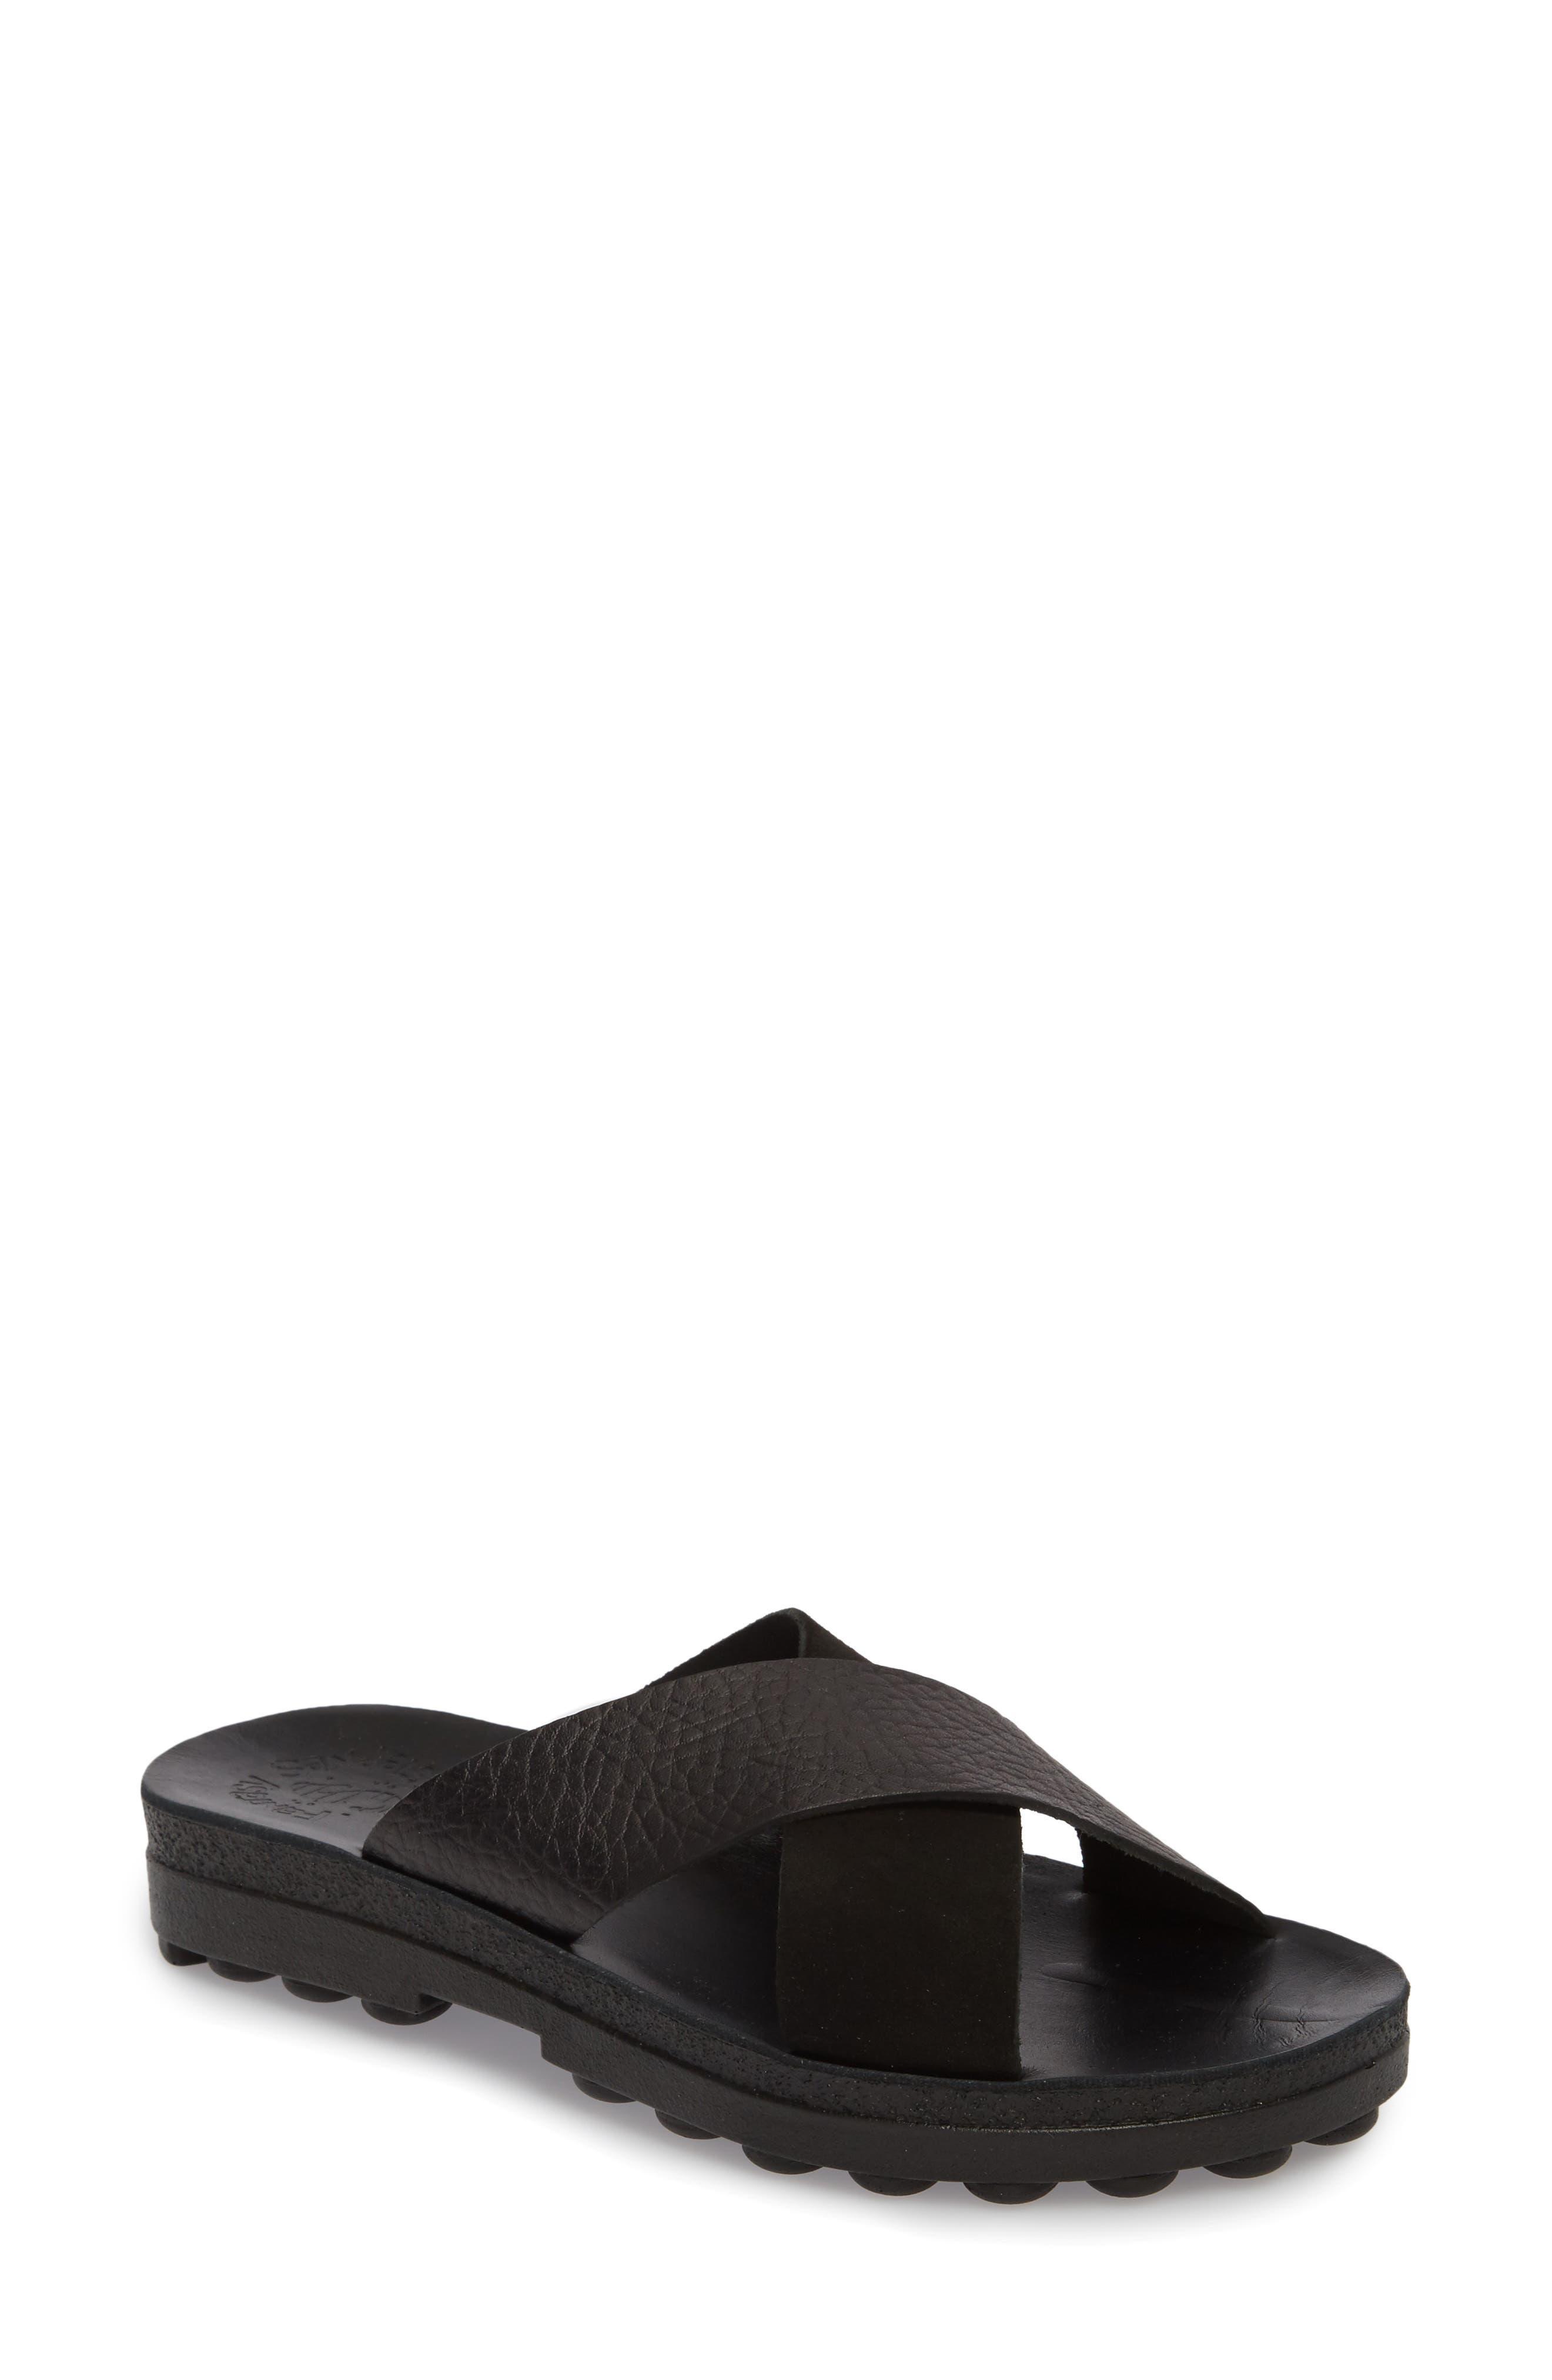 Charis Slide Sandal,                         Main,                         color, BLACK DOLARO LEATHER